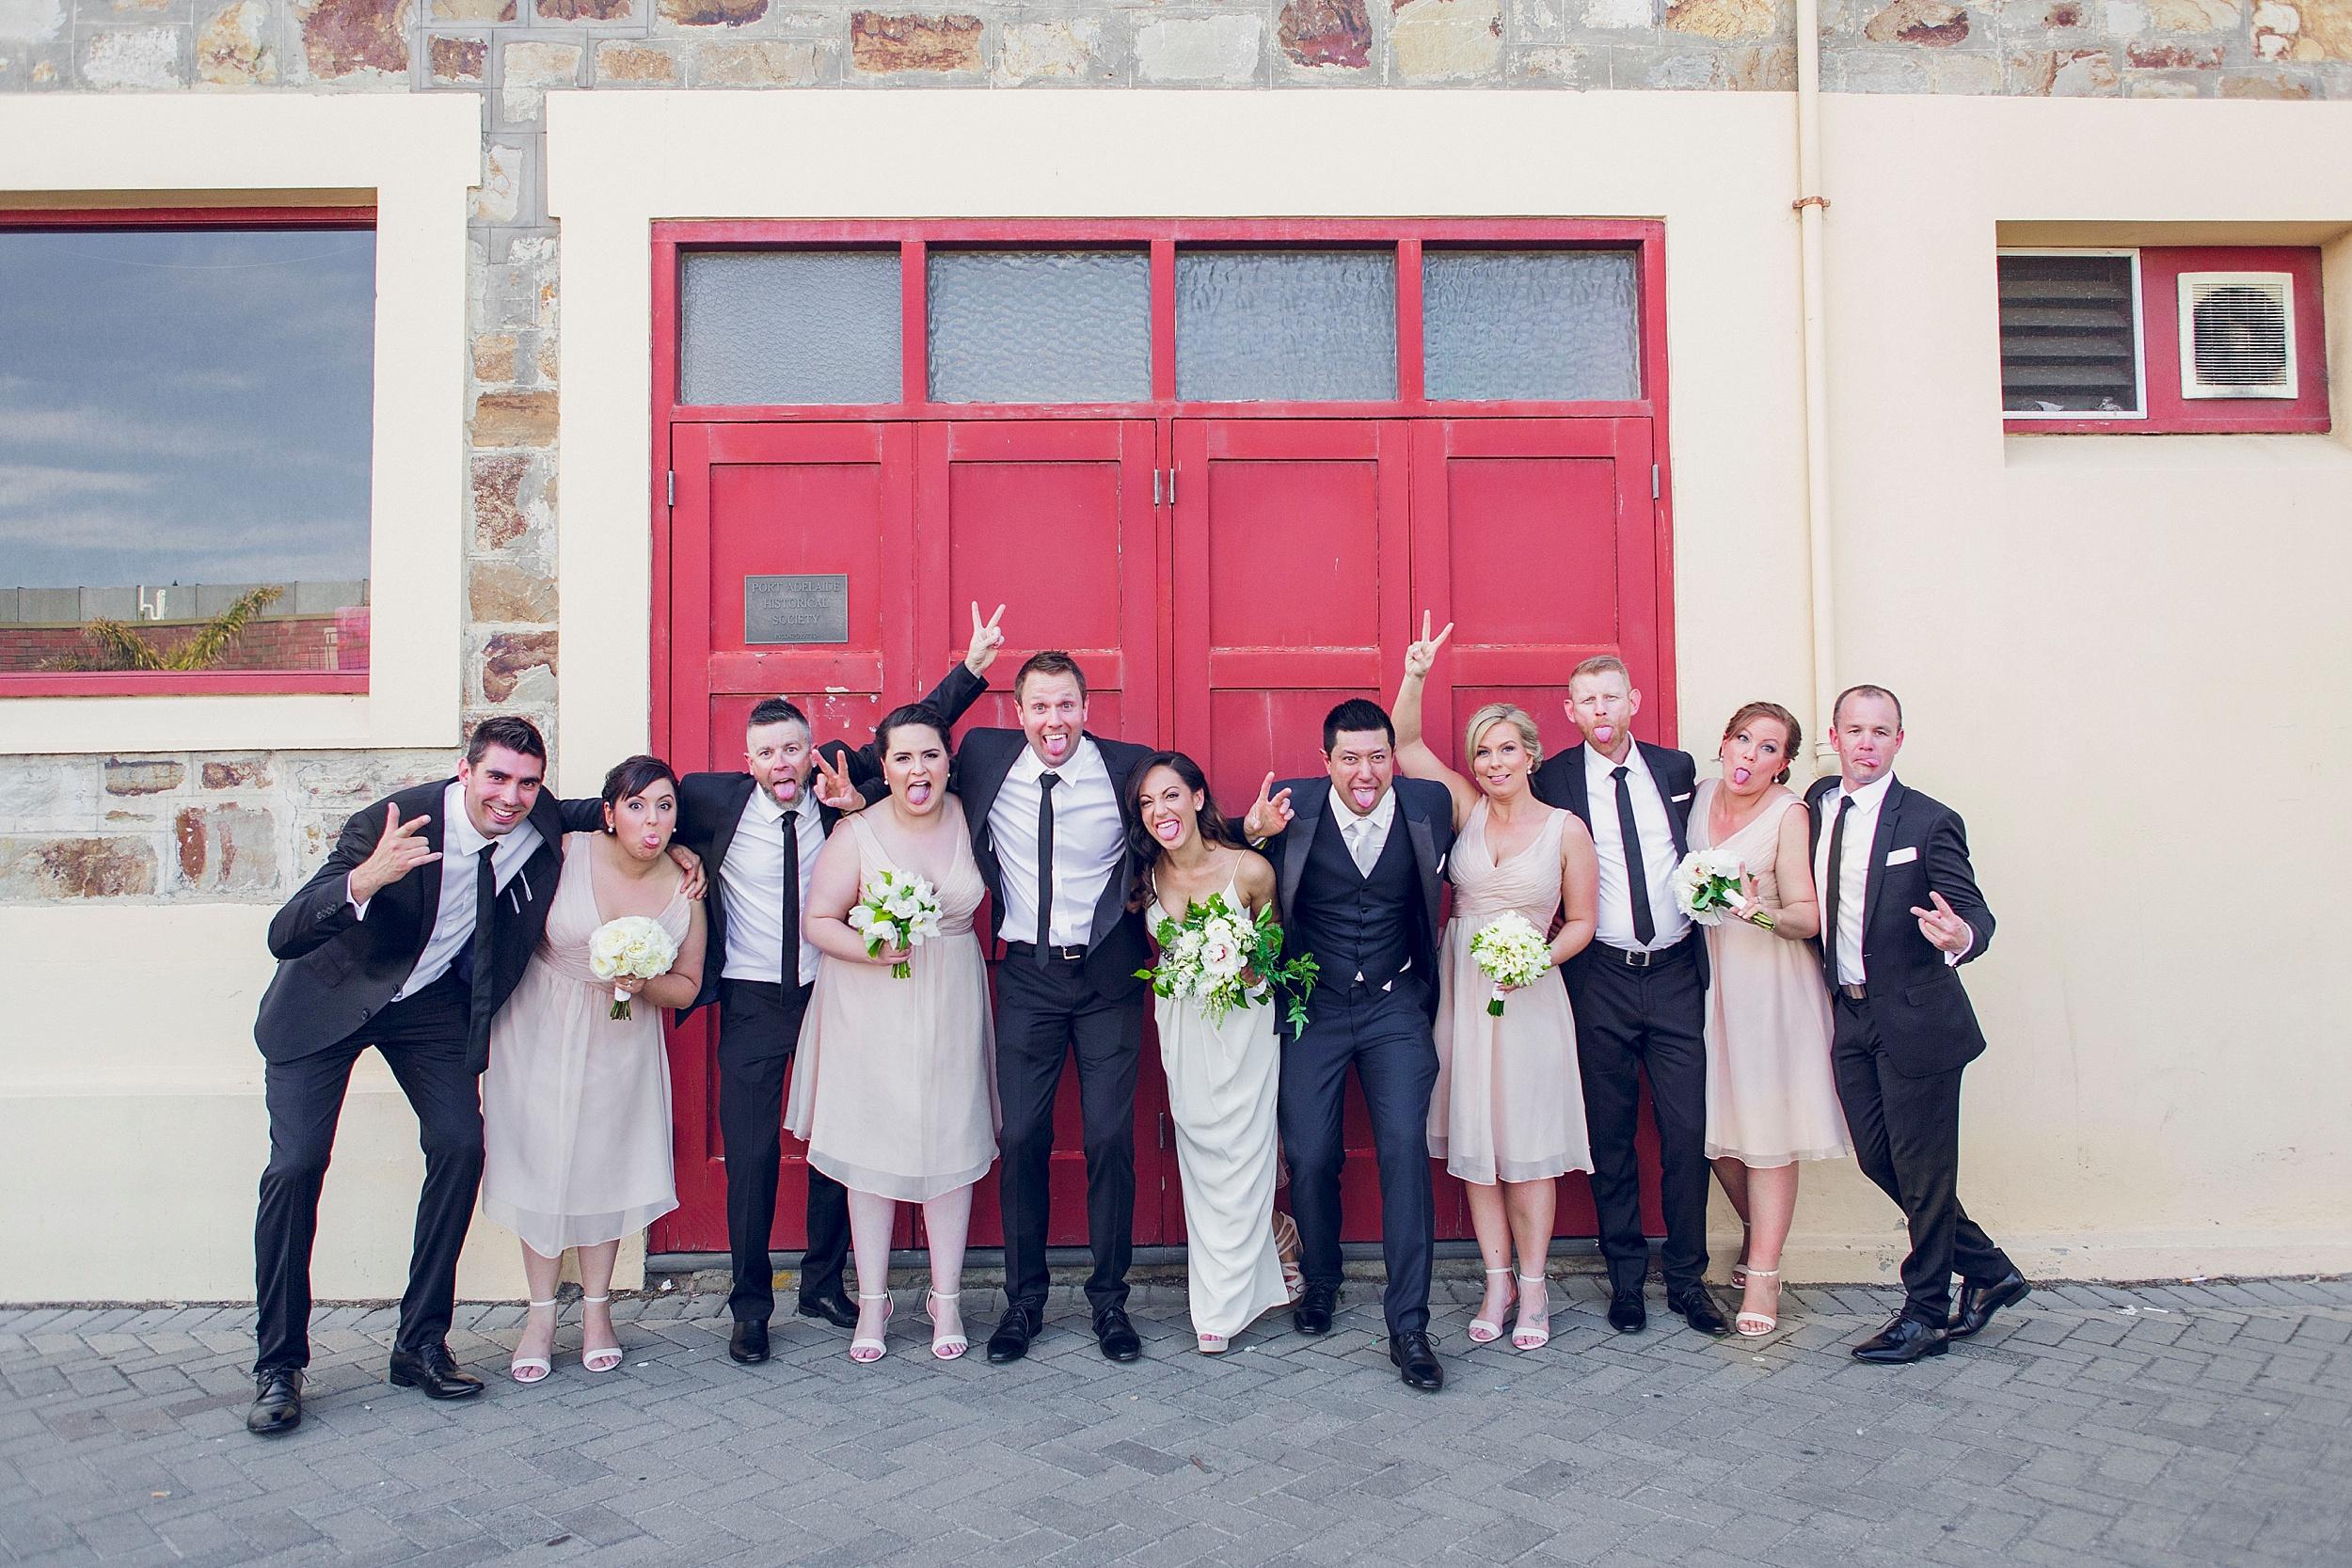 Adelaiade Wedding Photographer - pardon my french photography 155.jpg